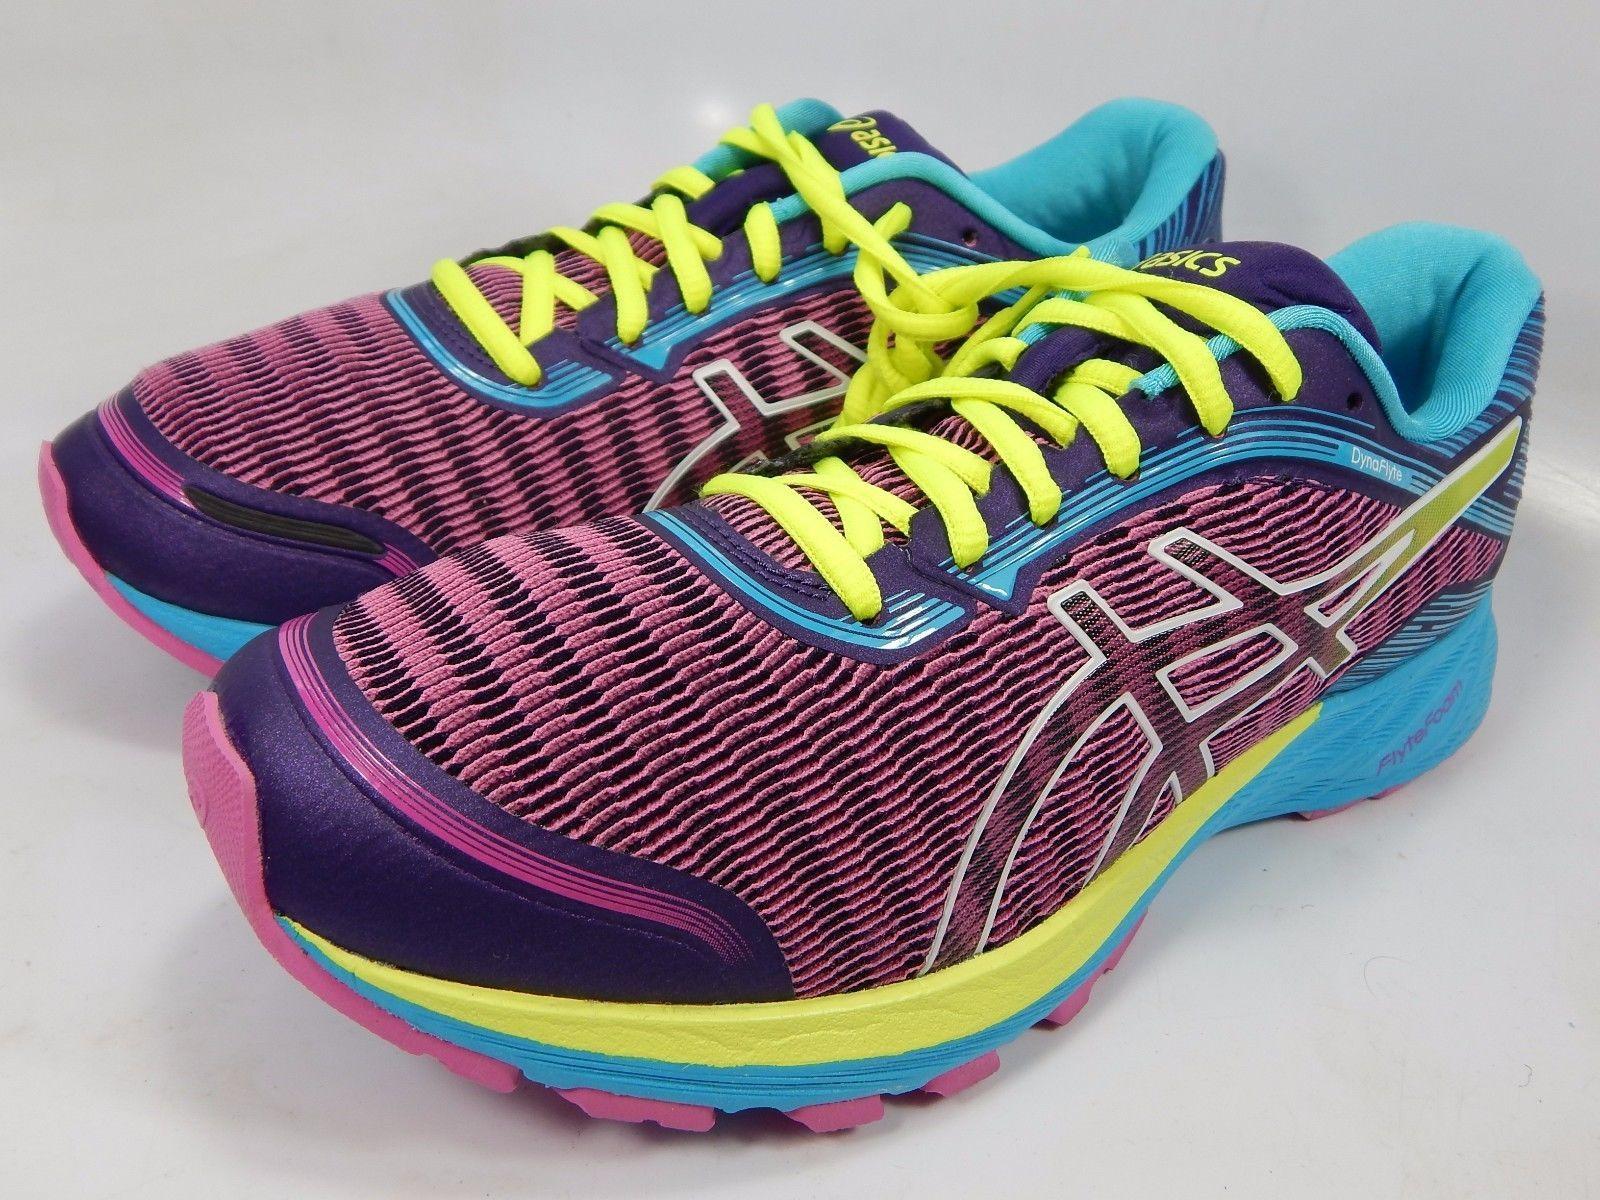 Asics Dynaflyte Women's Running Shoes Size US 10 M (B) EU 42 Purple T6F8Y